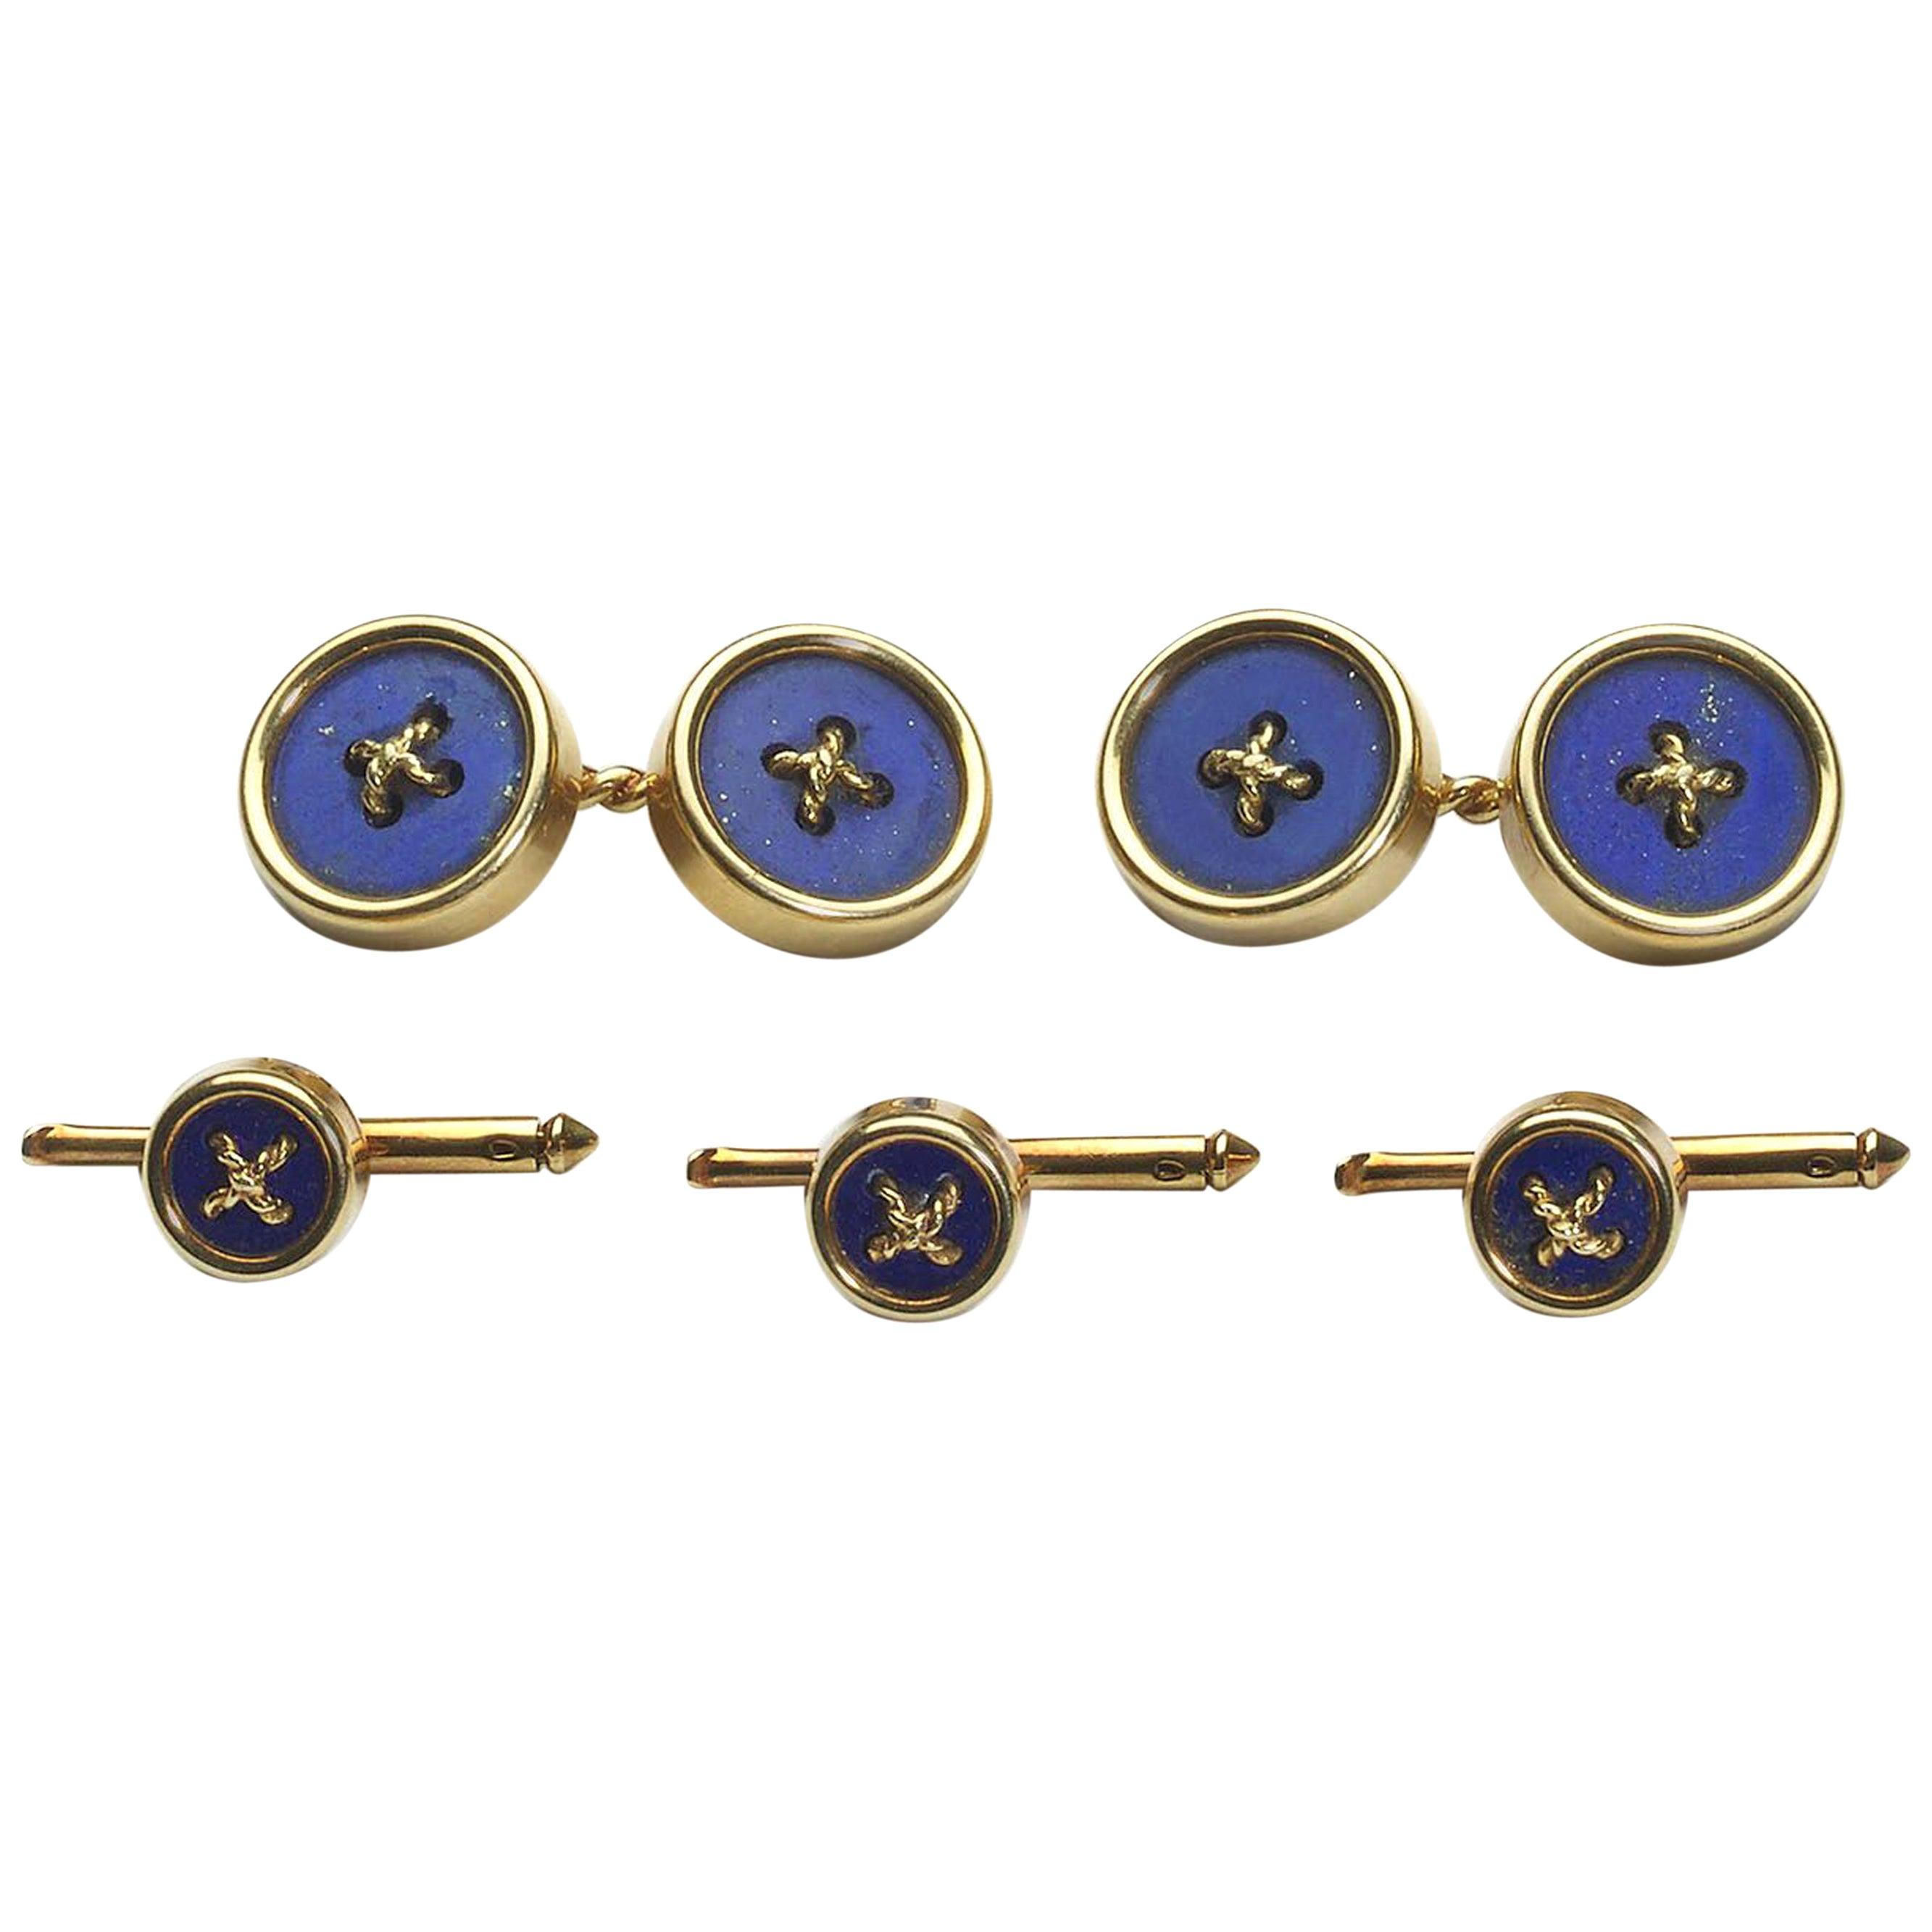 Tiffany & Co. Lapis Lazuli and Gold Dress-Set, circa 1970